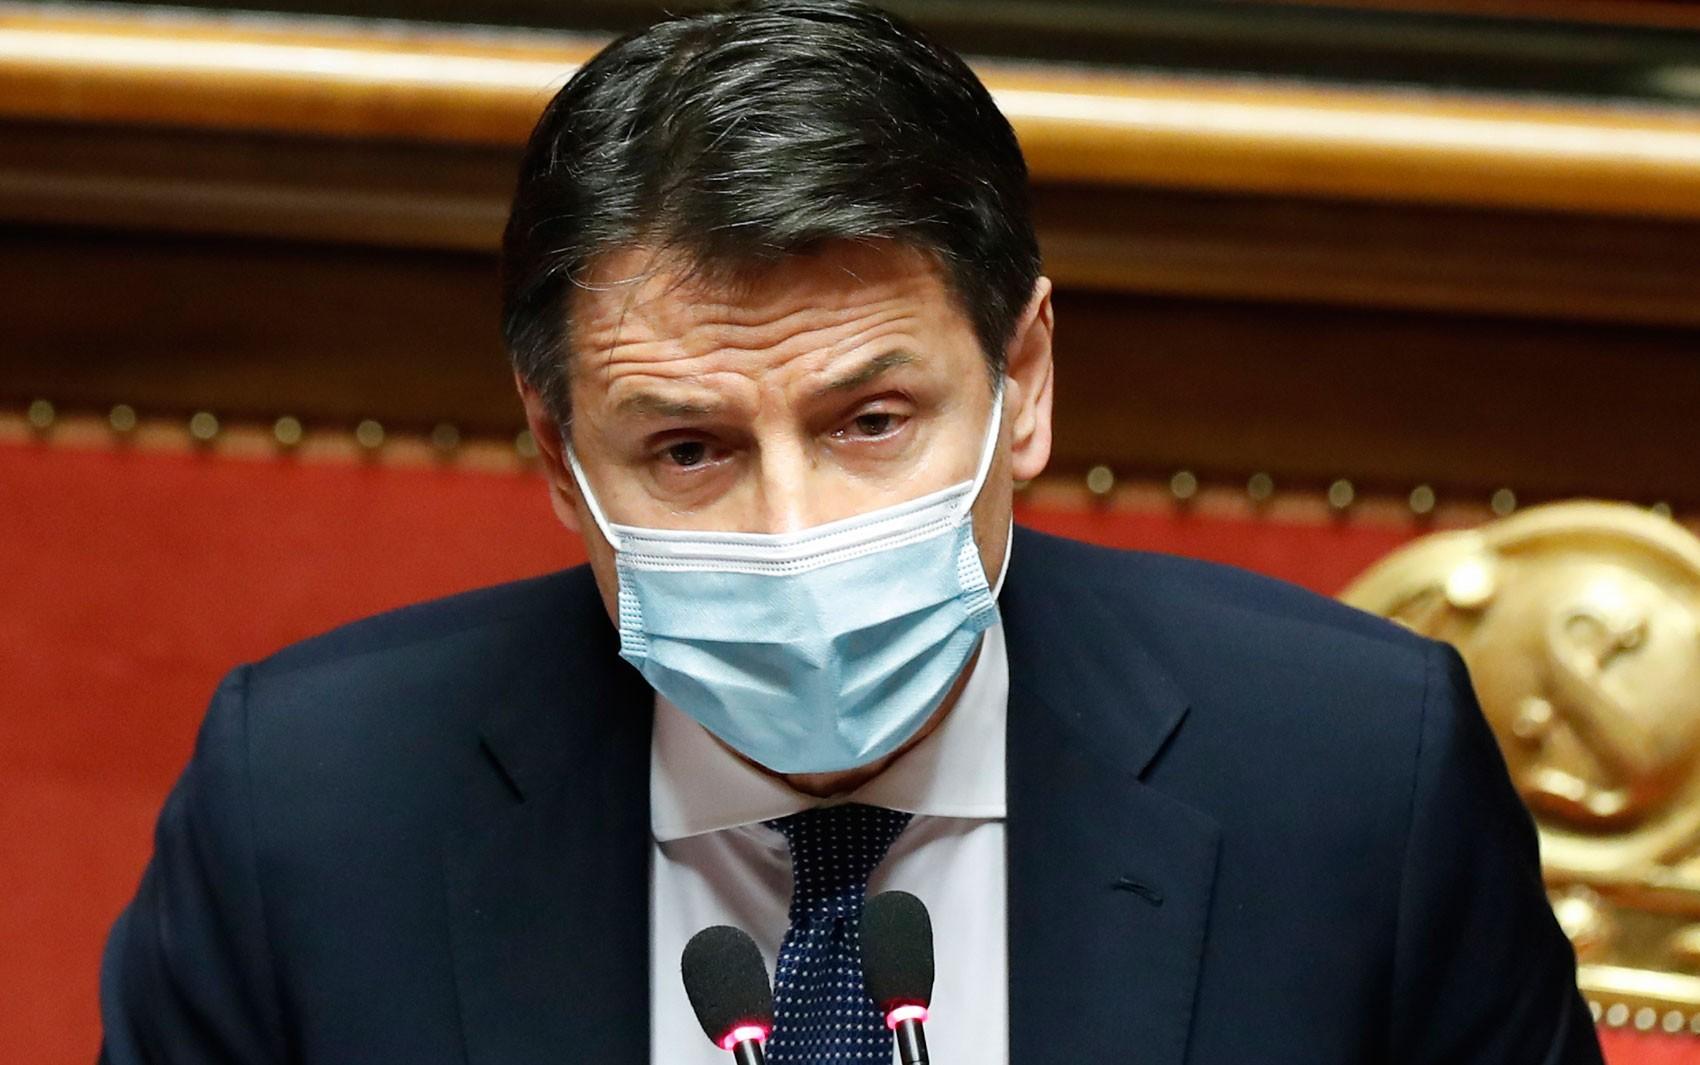 Primeiro-ministro italiano anuncia renúncia na terça-feira para buscar nova maioria